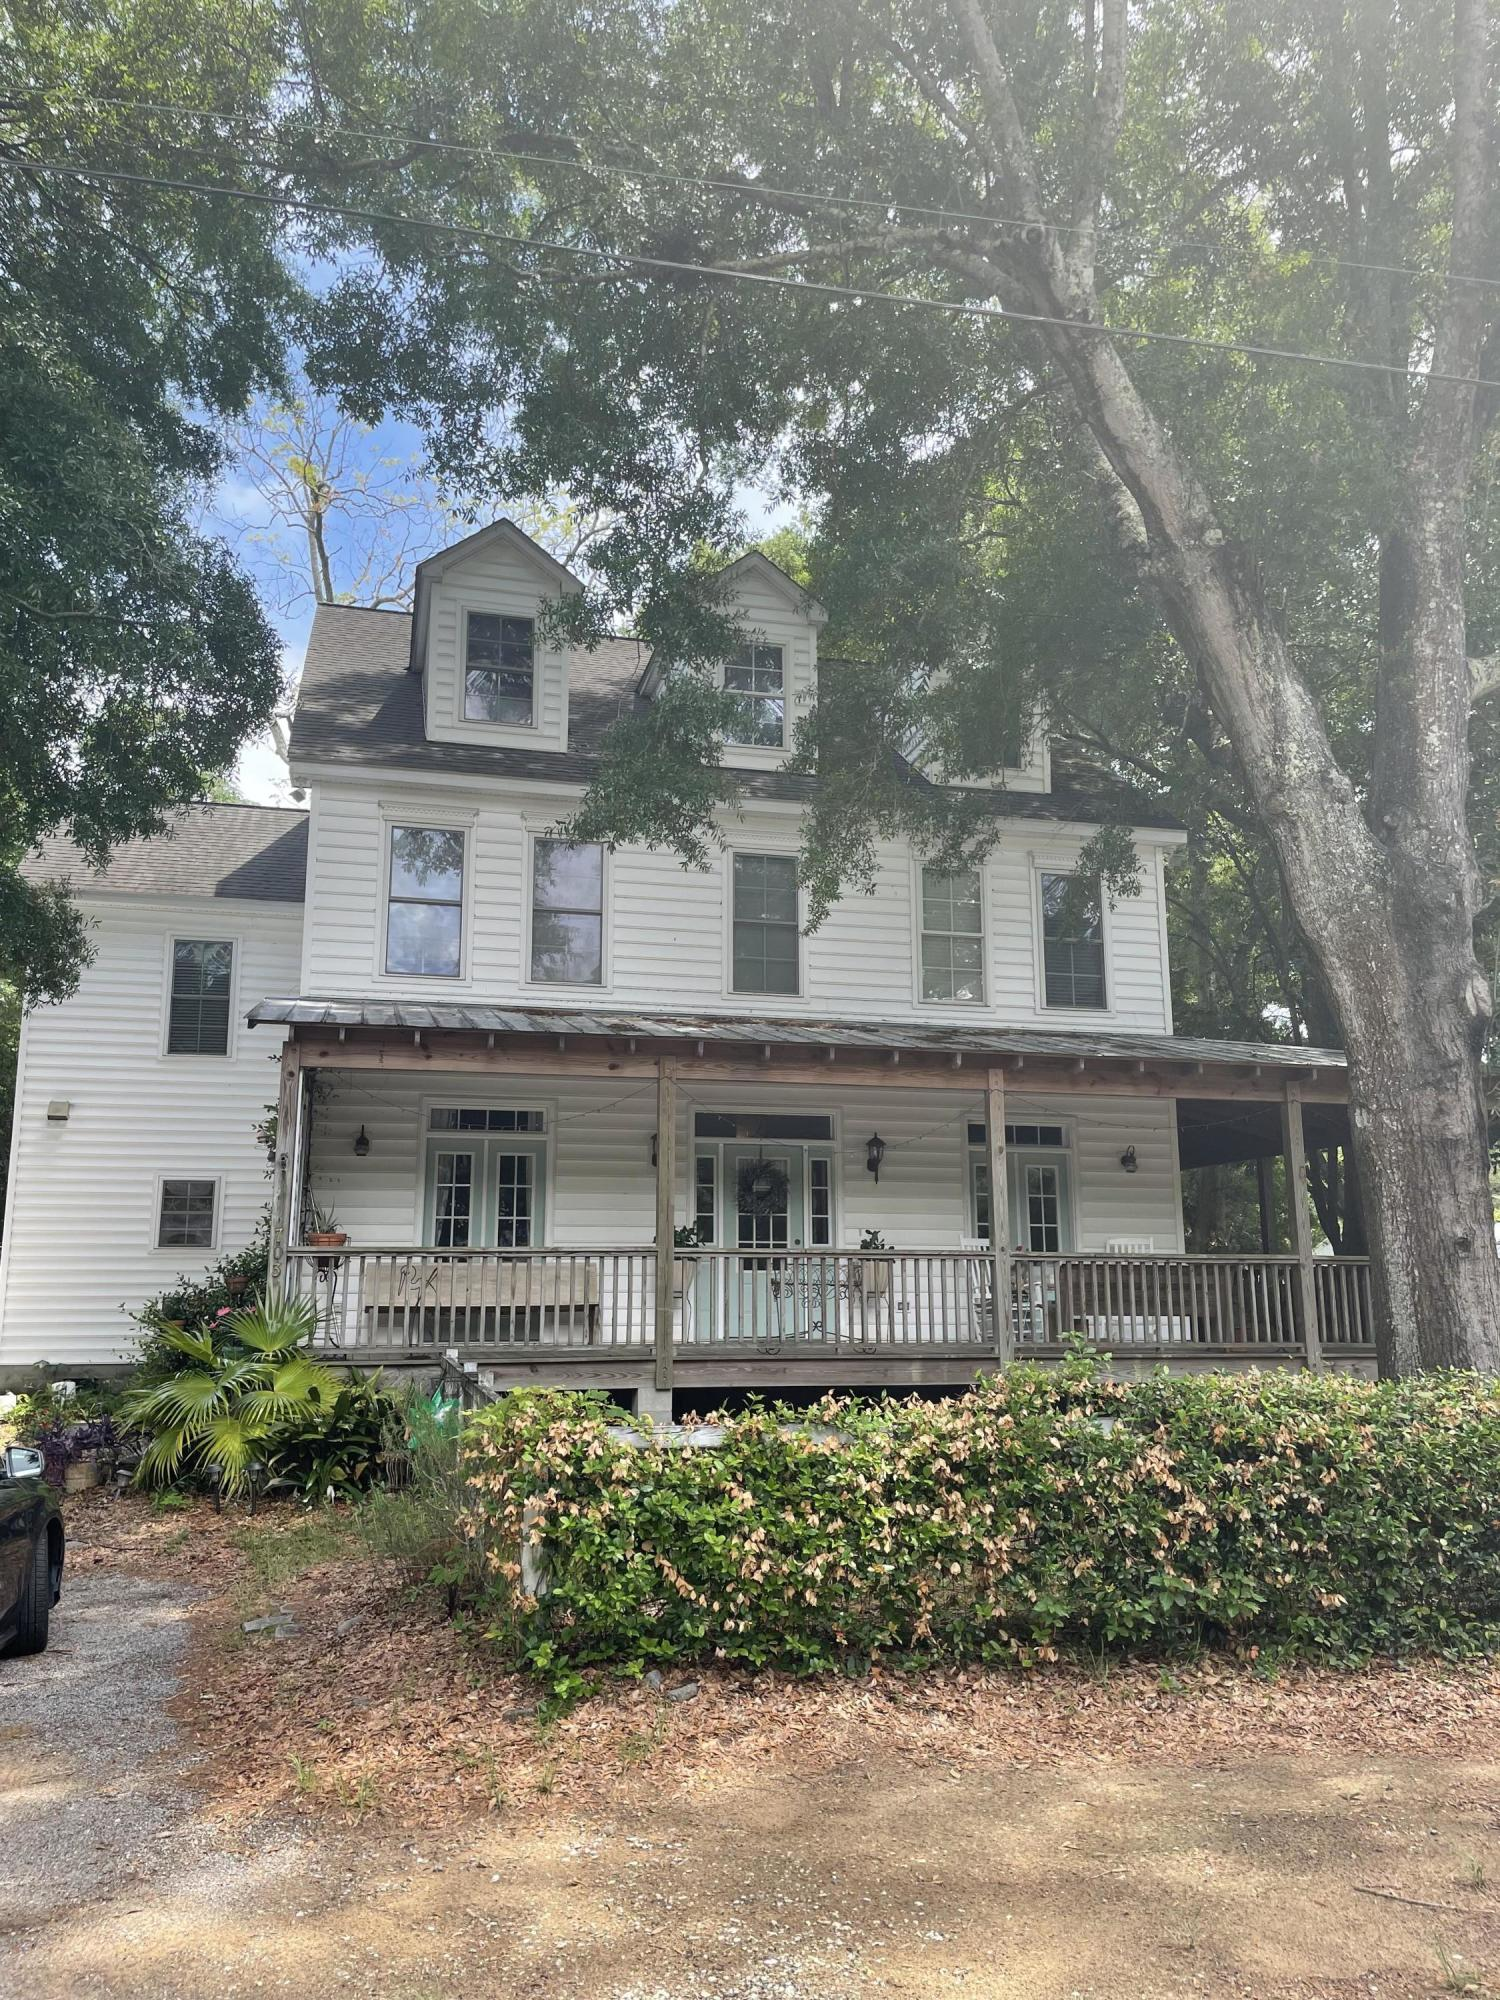 Old Mt Pleasant Homes For Sale - 703 Atlantic, Mount Pleasant, SC - 4